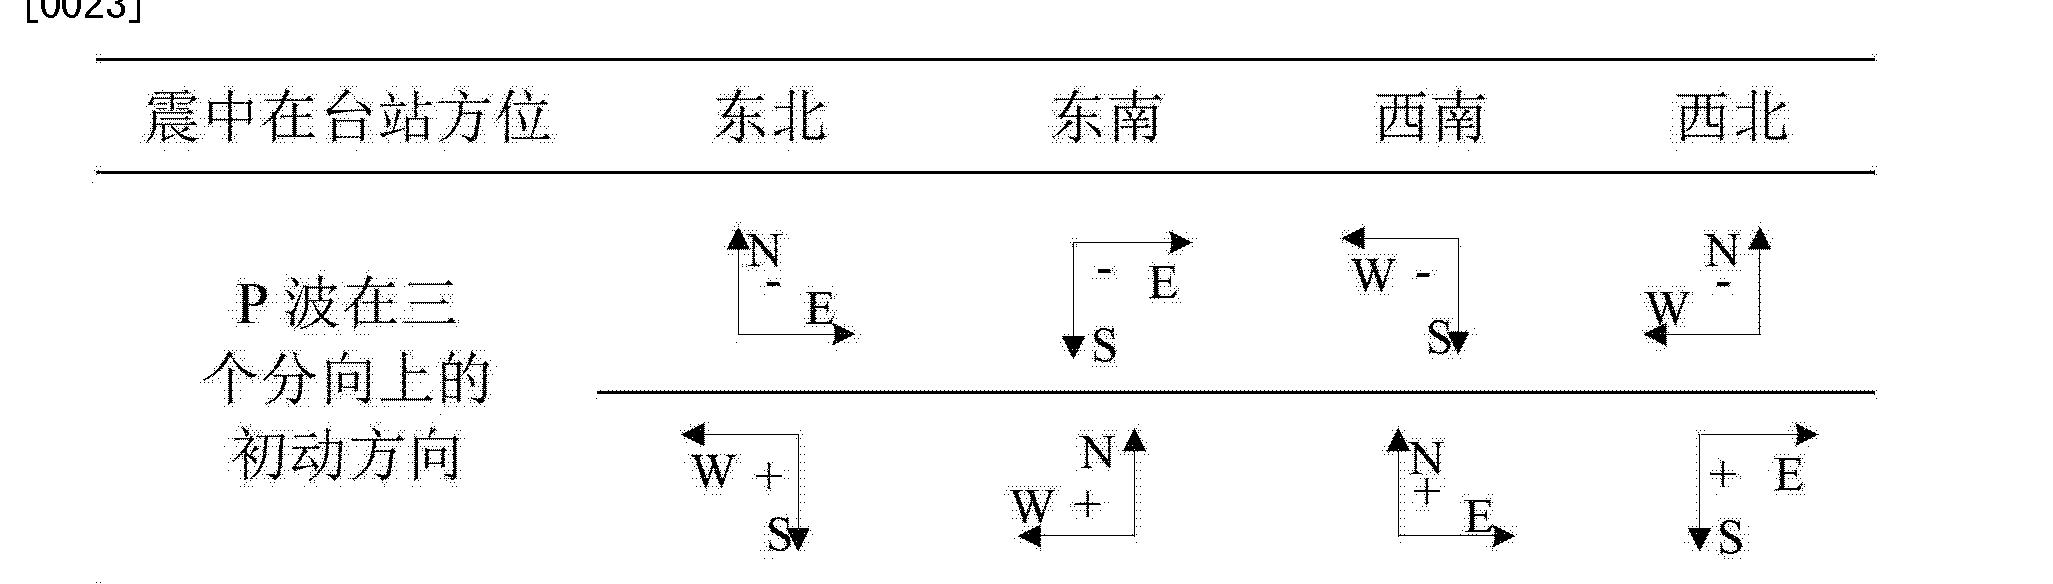 Figure CN103336299AD00052